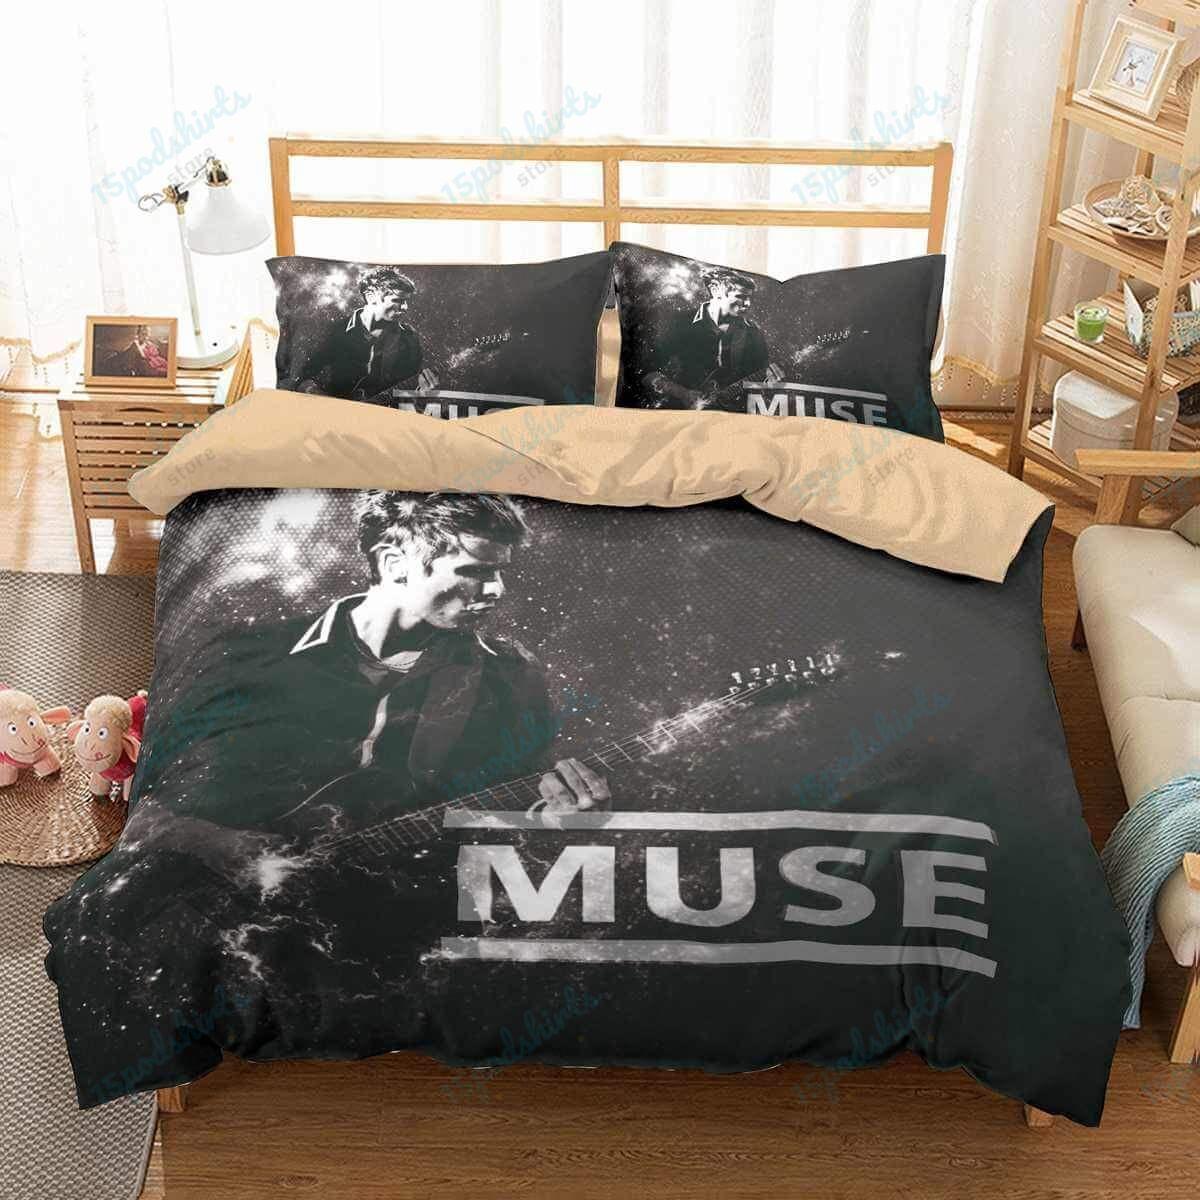 Muse Duvet Cover Bedding Set